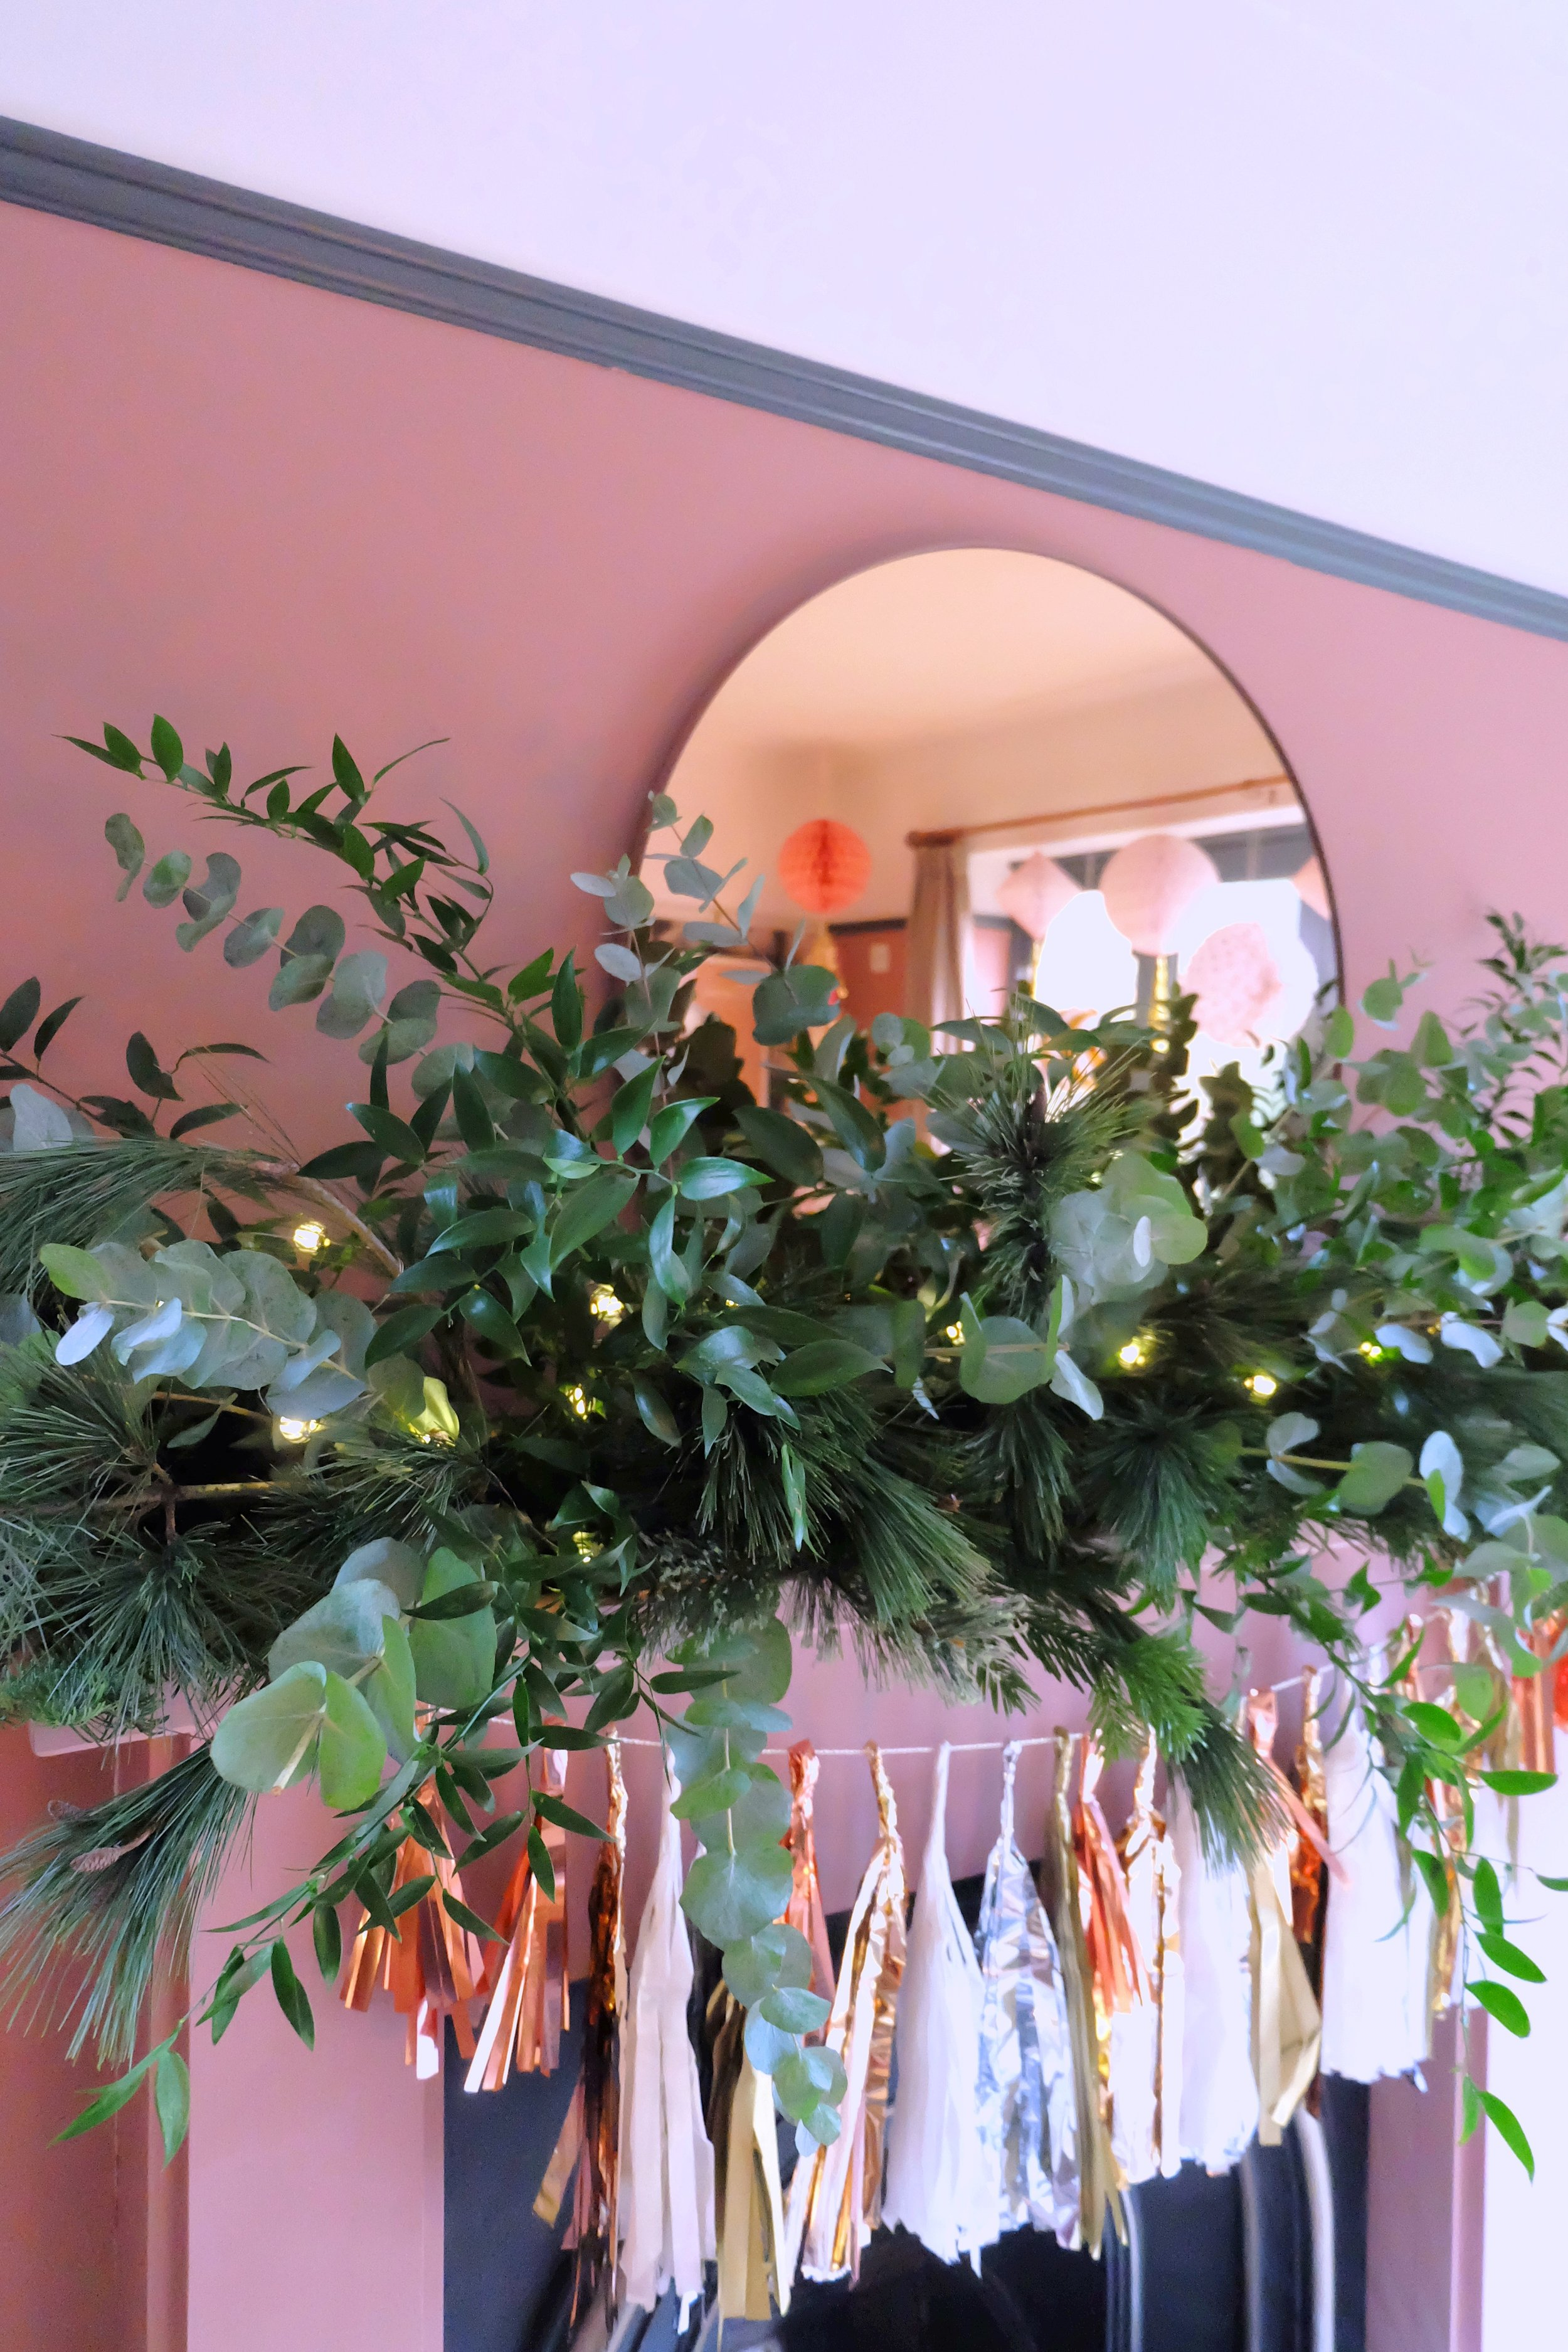 Festive foliage mantelpiece